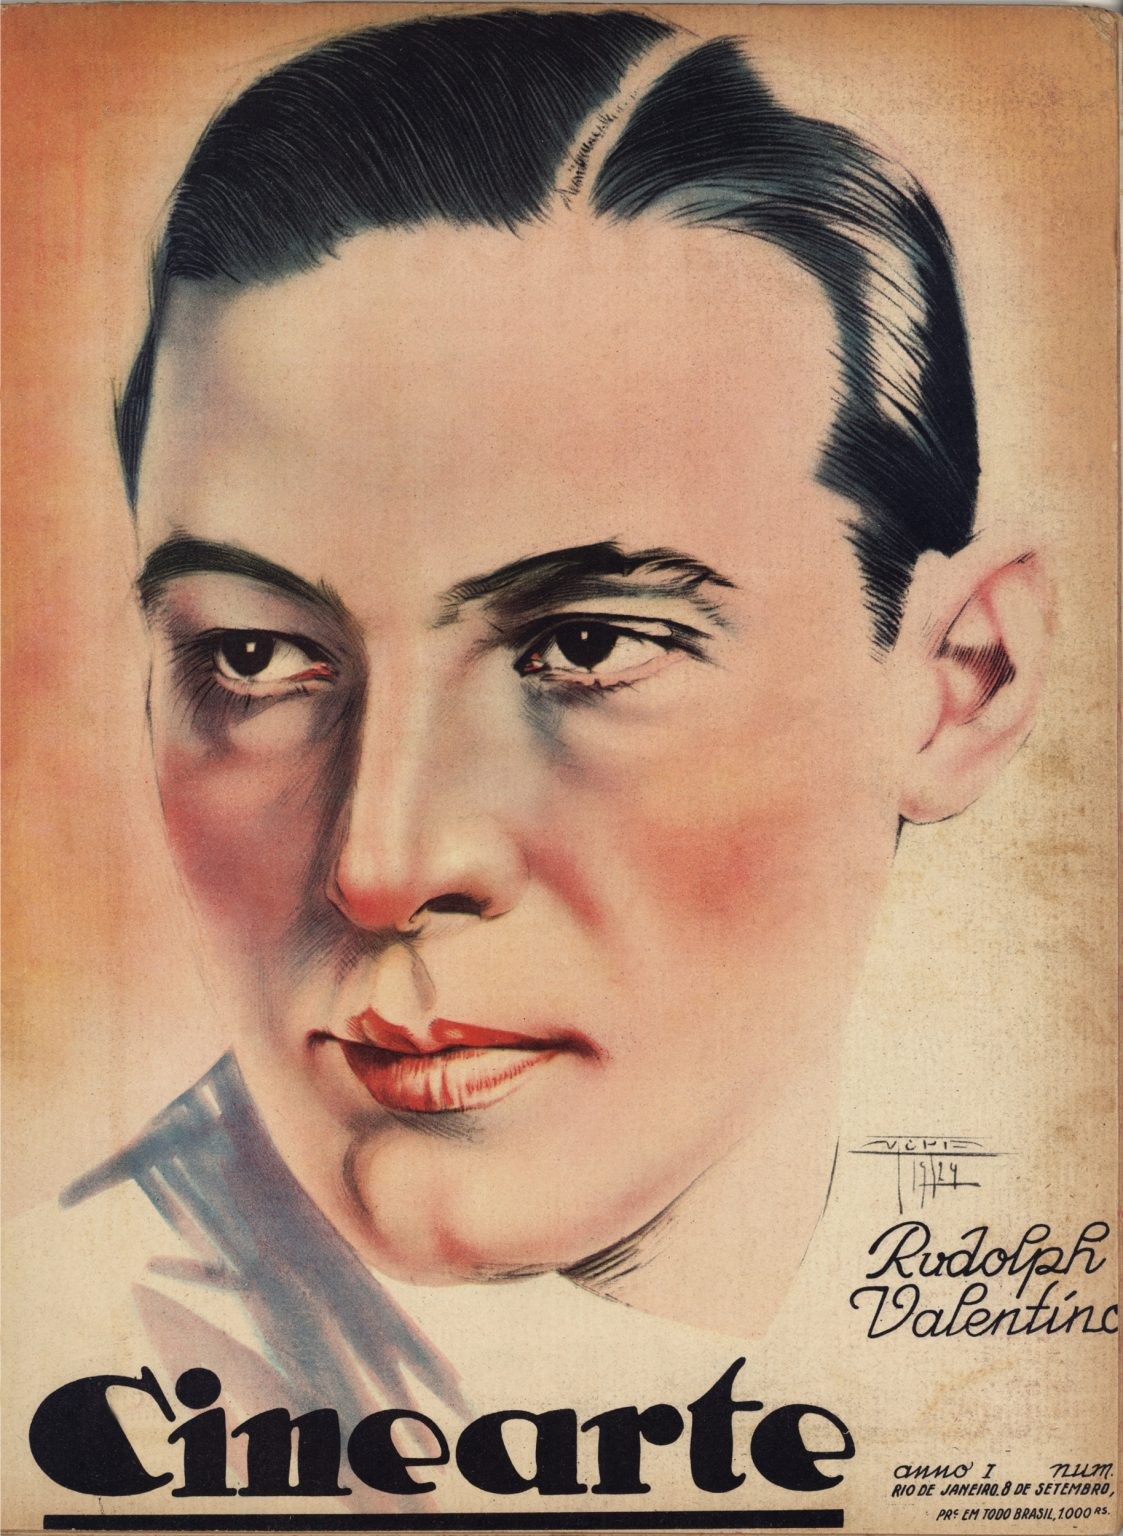 rudolph-valentino-1895-1926